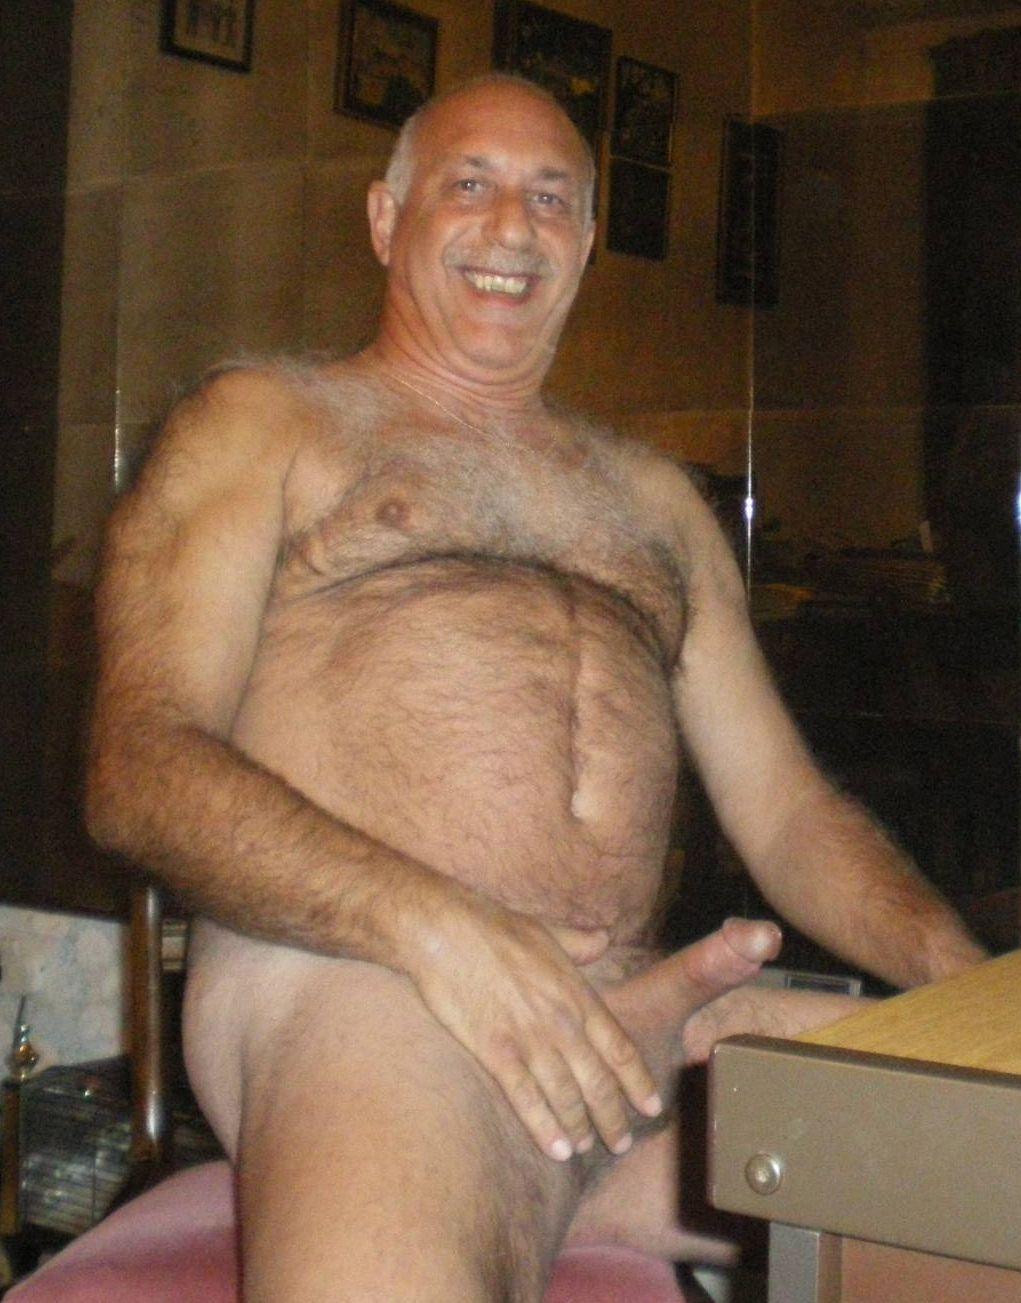 mermaid-and-free-mature-daddies-senior-men-galleries-pussy-red-head